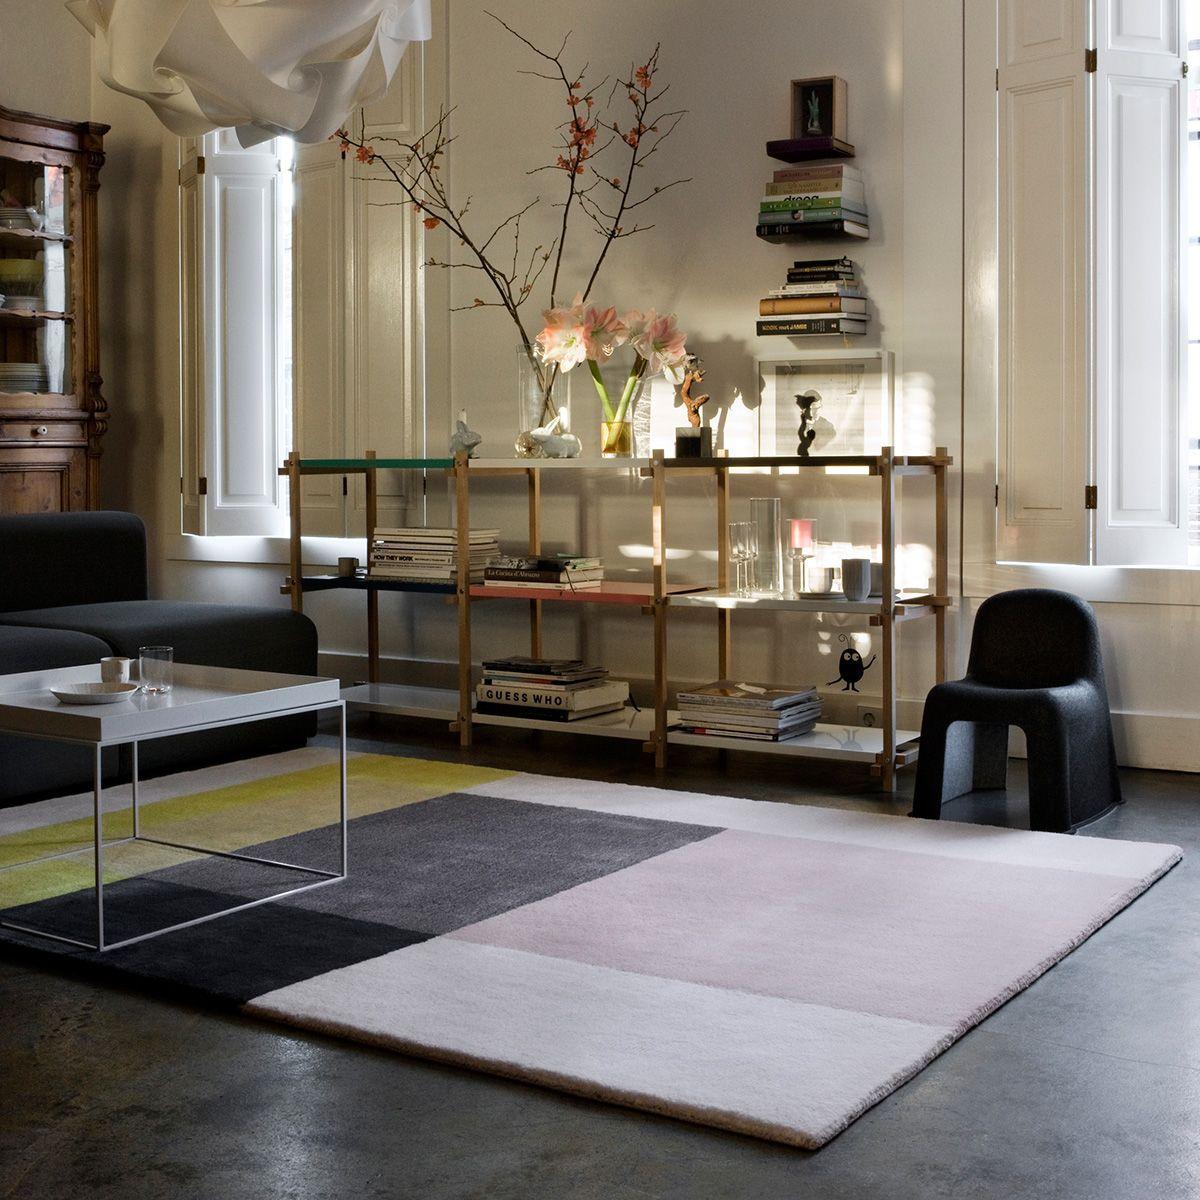 Hay Teppich Colour Carpet 240 cm x 170 cm, Muster 05 #HAY #artvoll #TopMarke www.artvoll.de